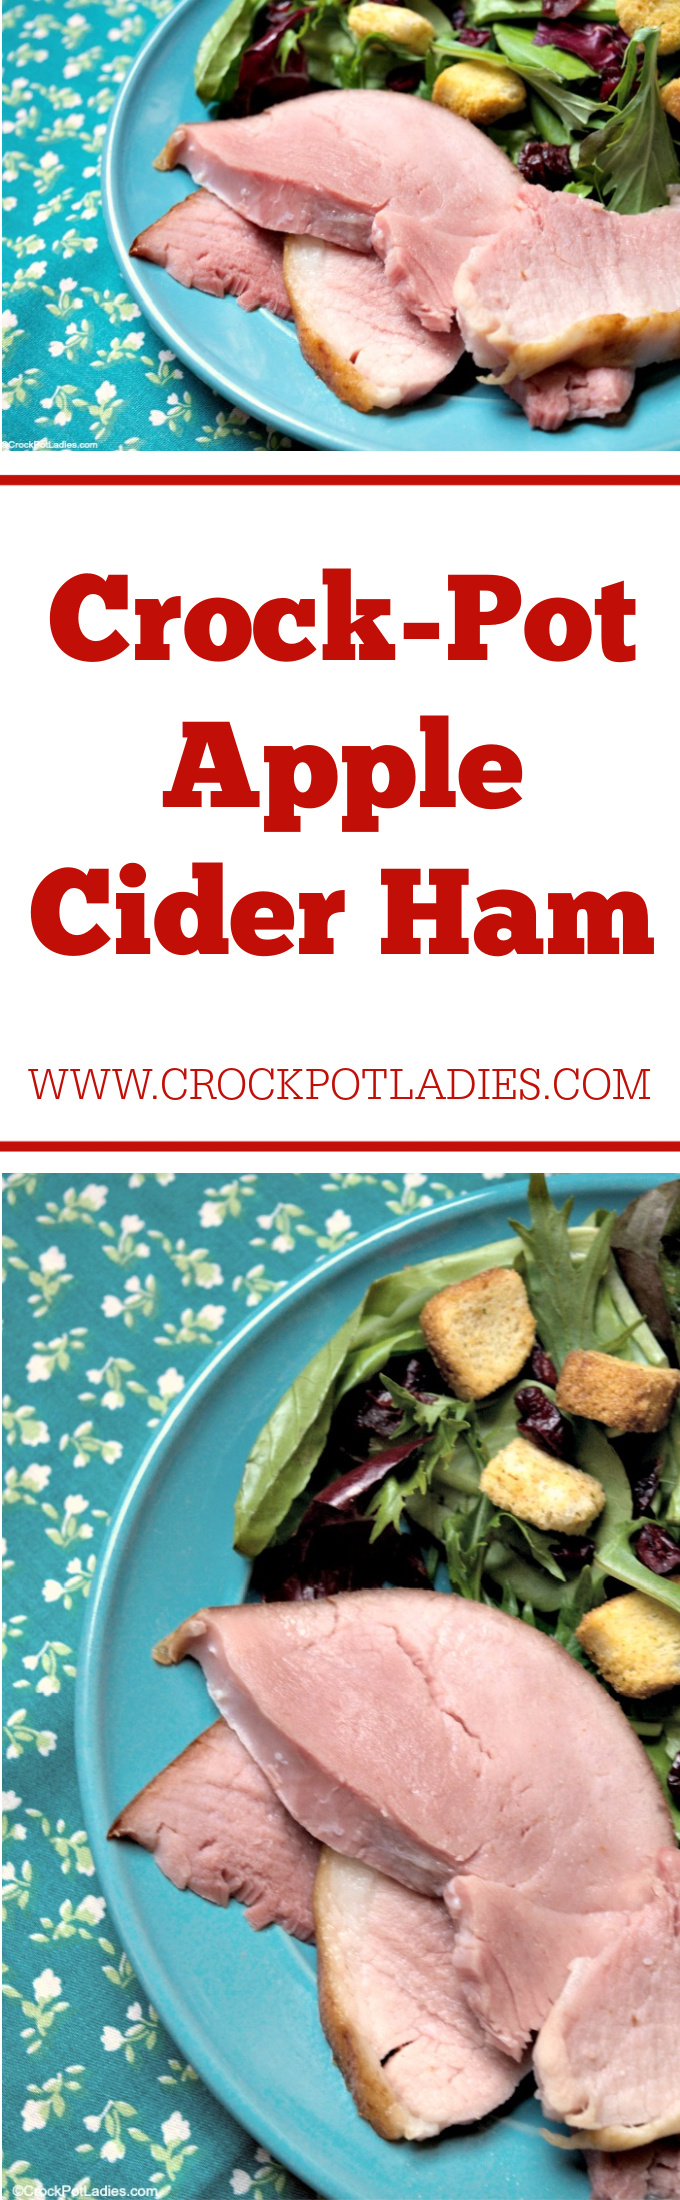 Crock-Pot Apple Cider Ham